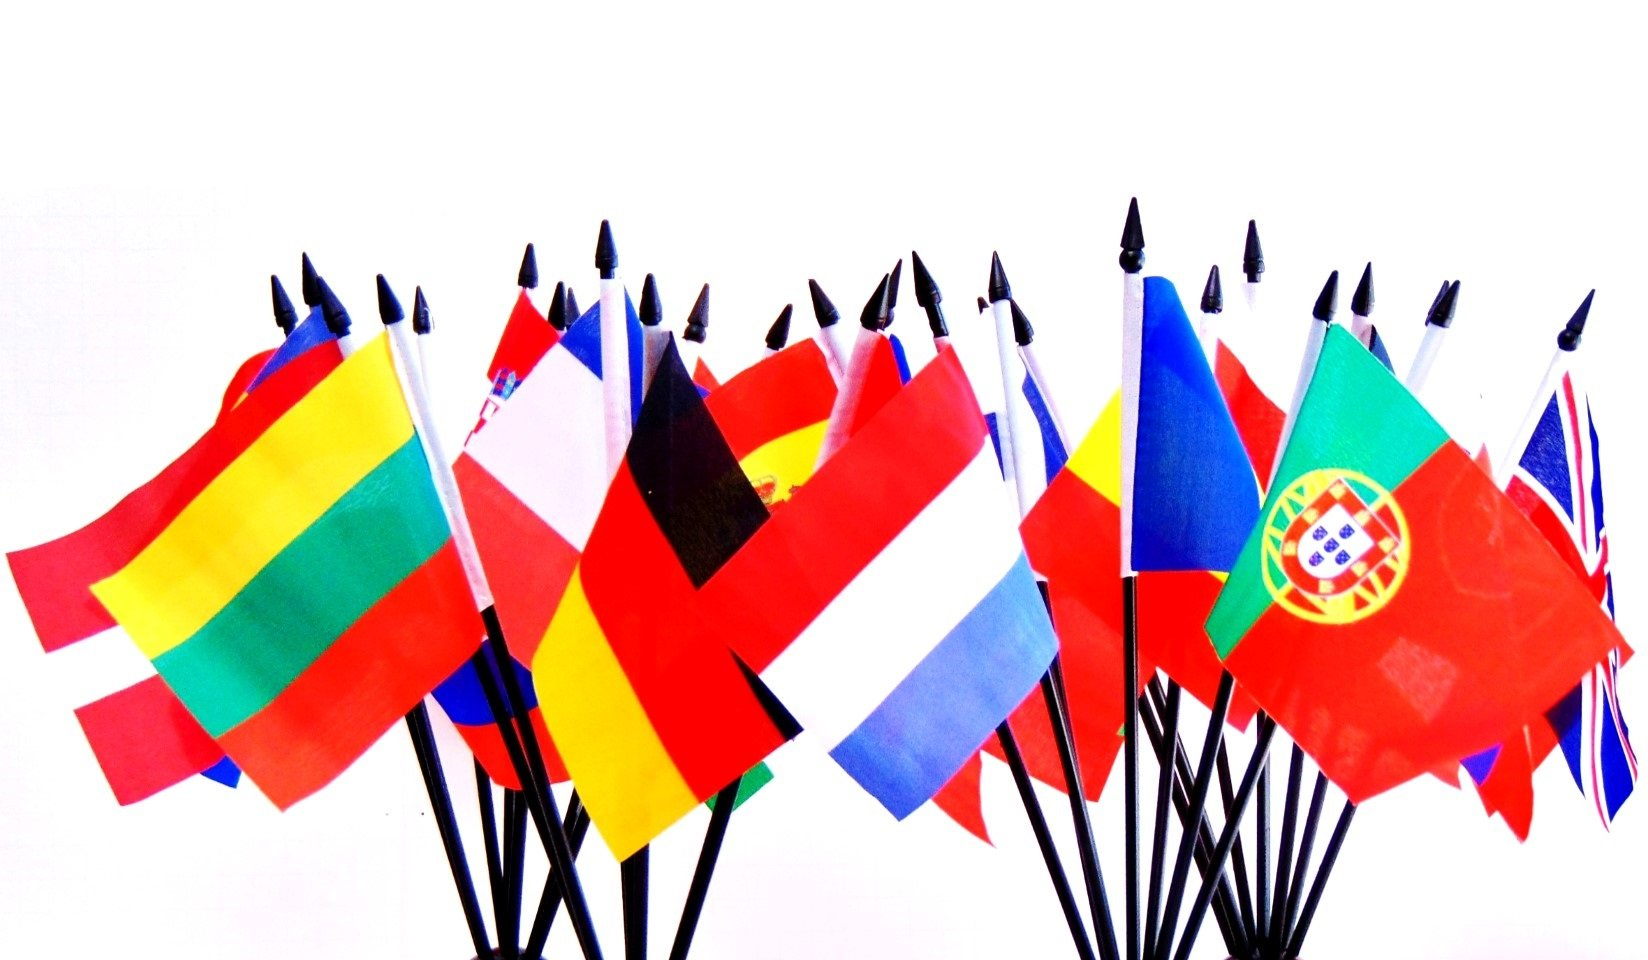 European Union (EU) World Flag SET-28 Polyester 4''x6'' Flags, One Flag for Each Country in The European Union 4x6 Miniature Desk & Table Flags, Small Mini Stick Flags